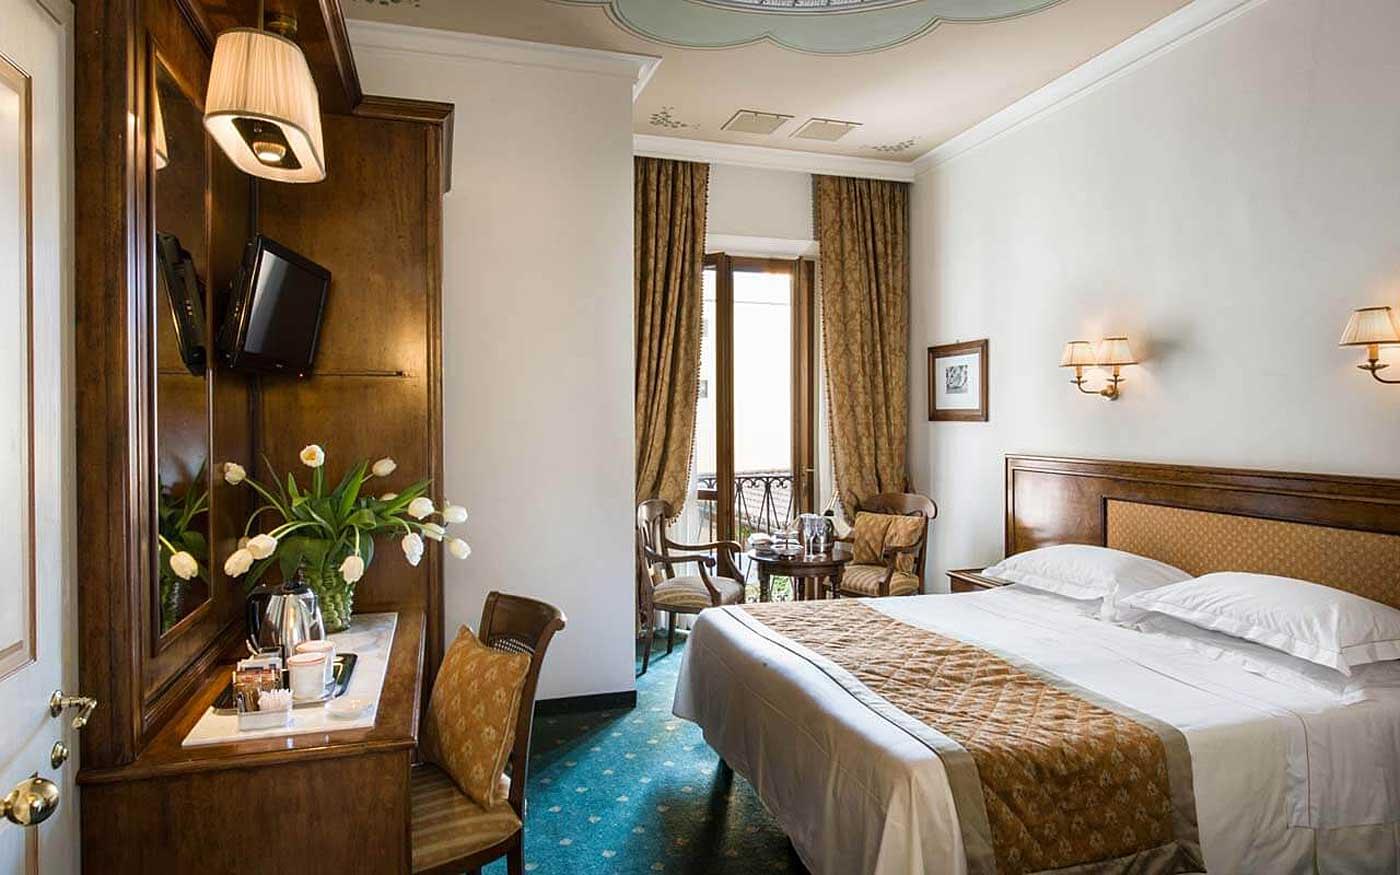 Double room - Hotel Adler Cavalieri, Florence Italy